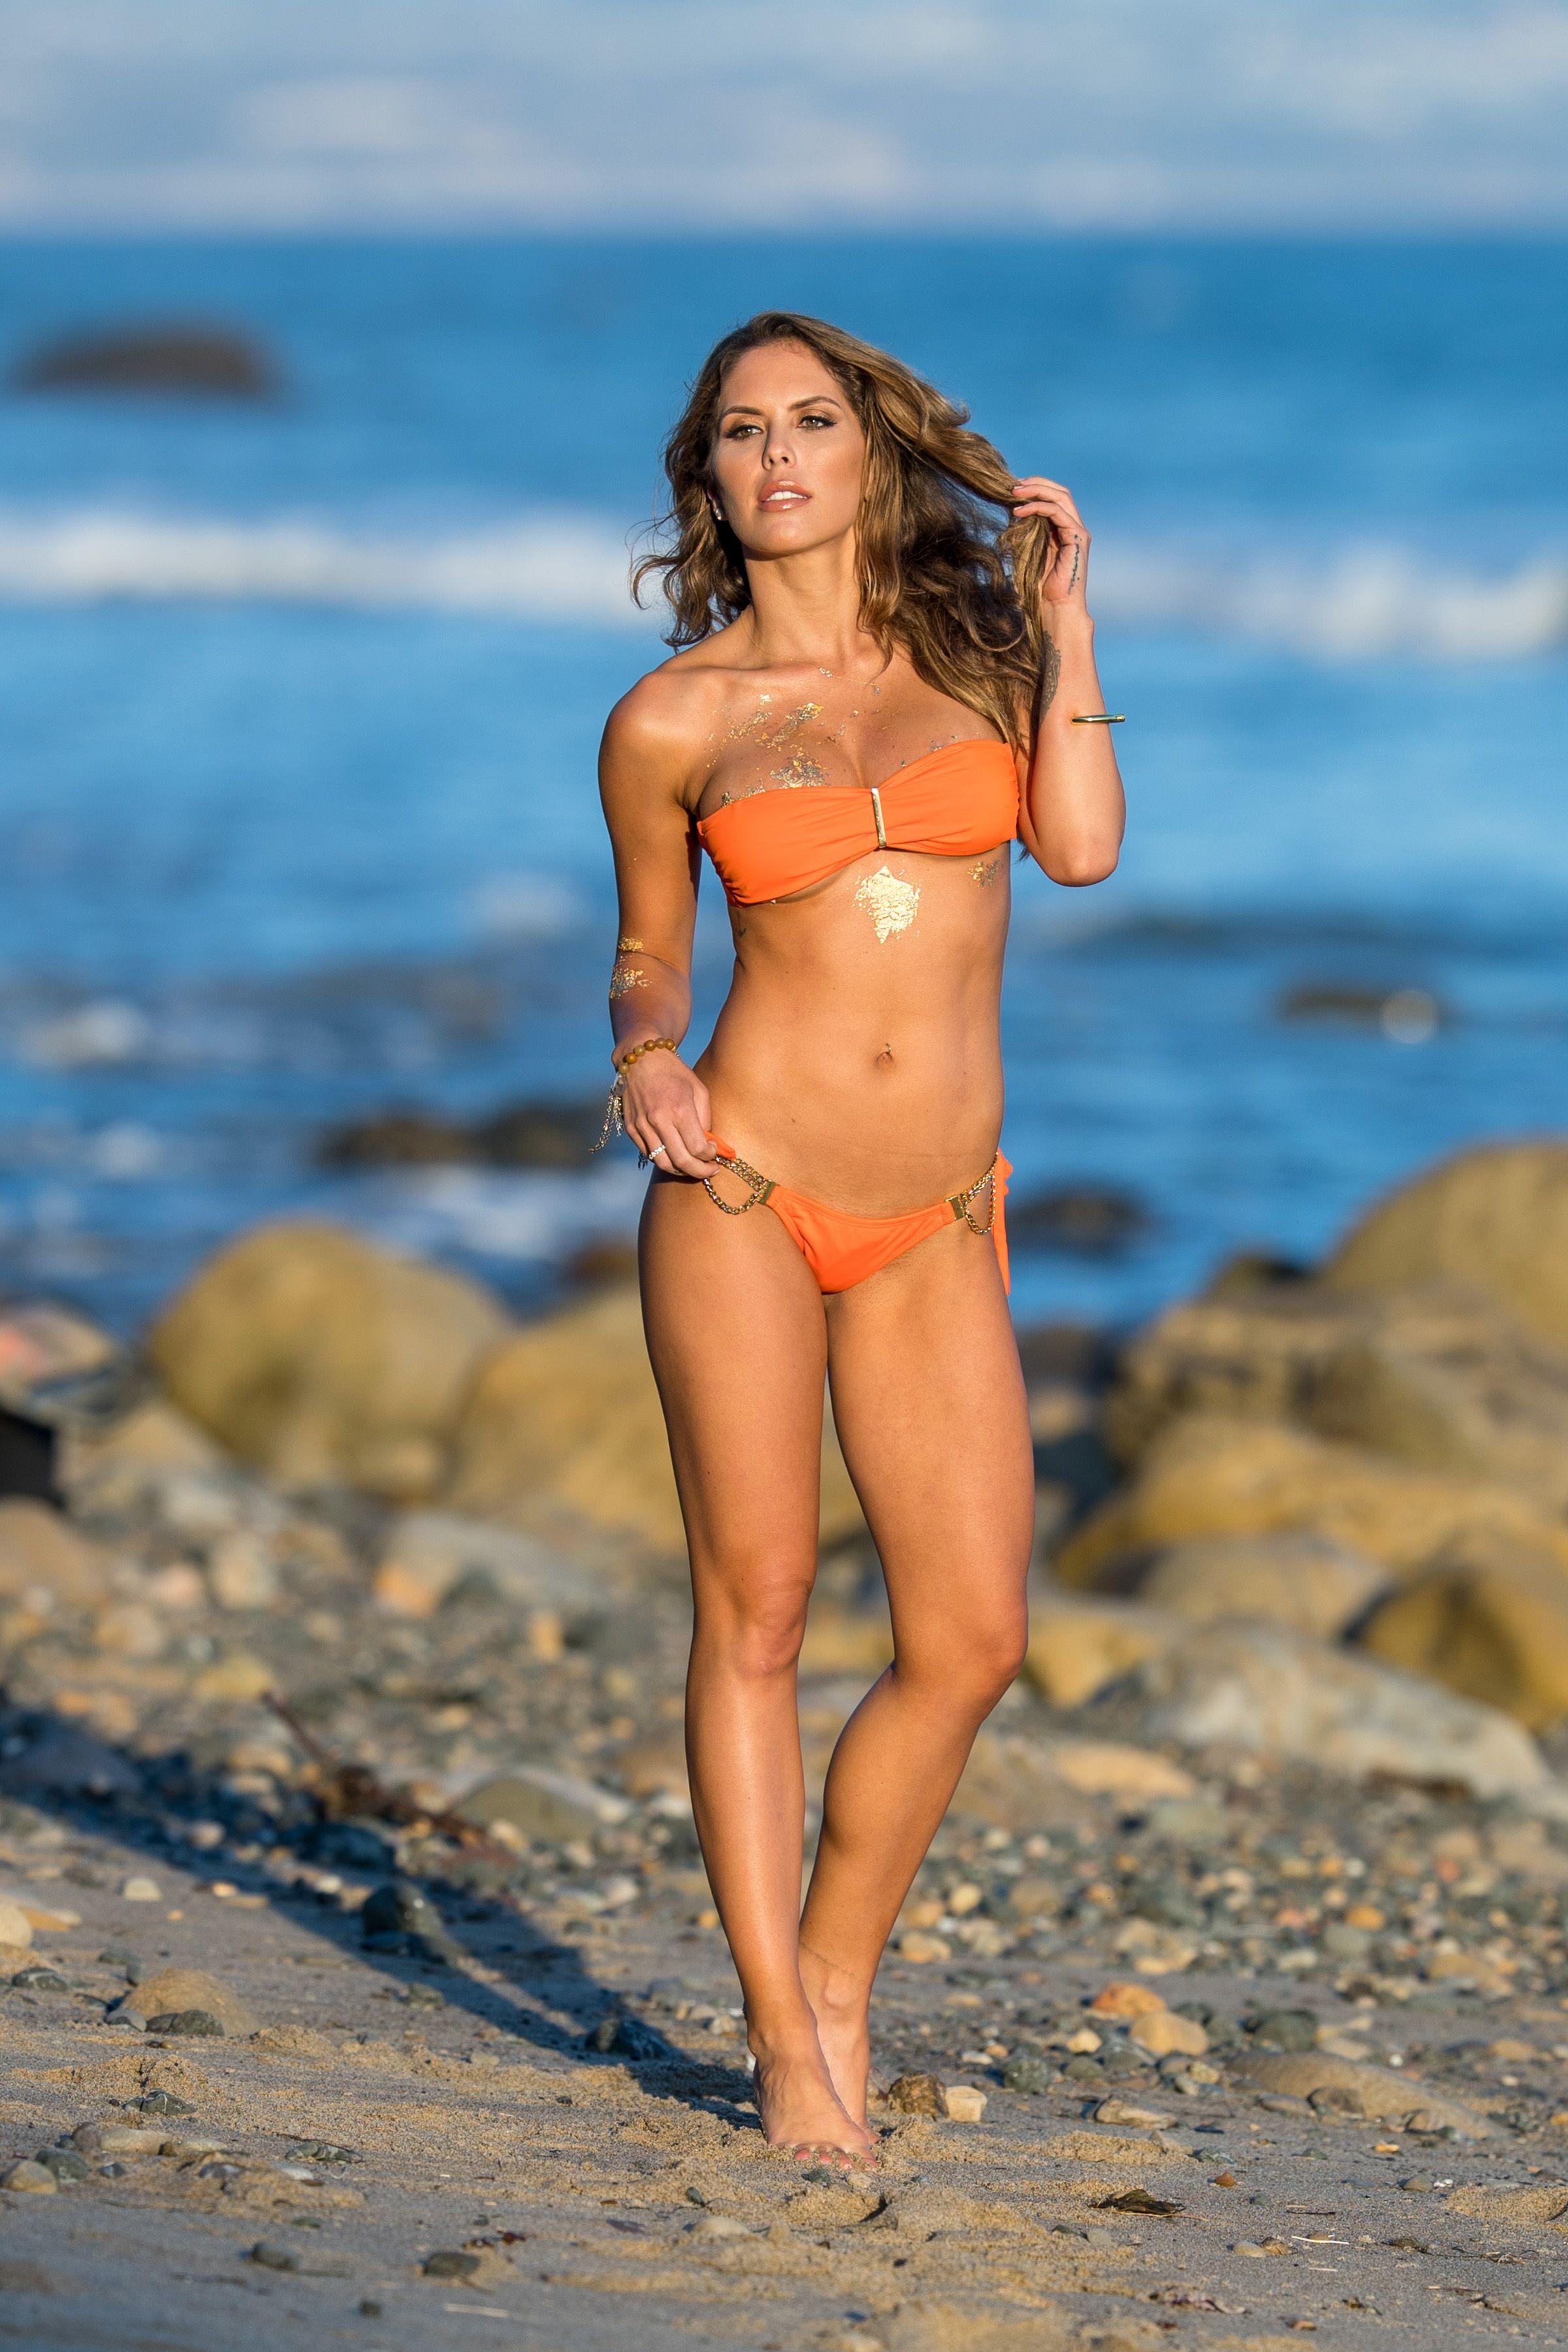 Brittney-Palmer-Sexy-Topless-16-thefappeningblog.com_.jpg